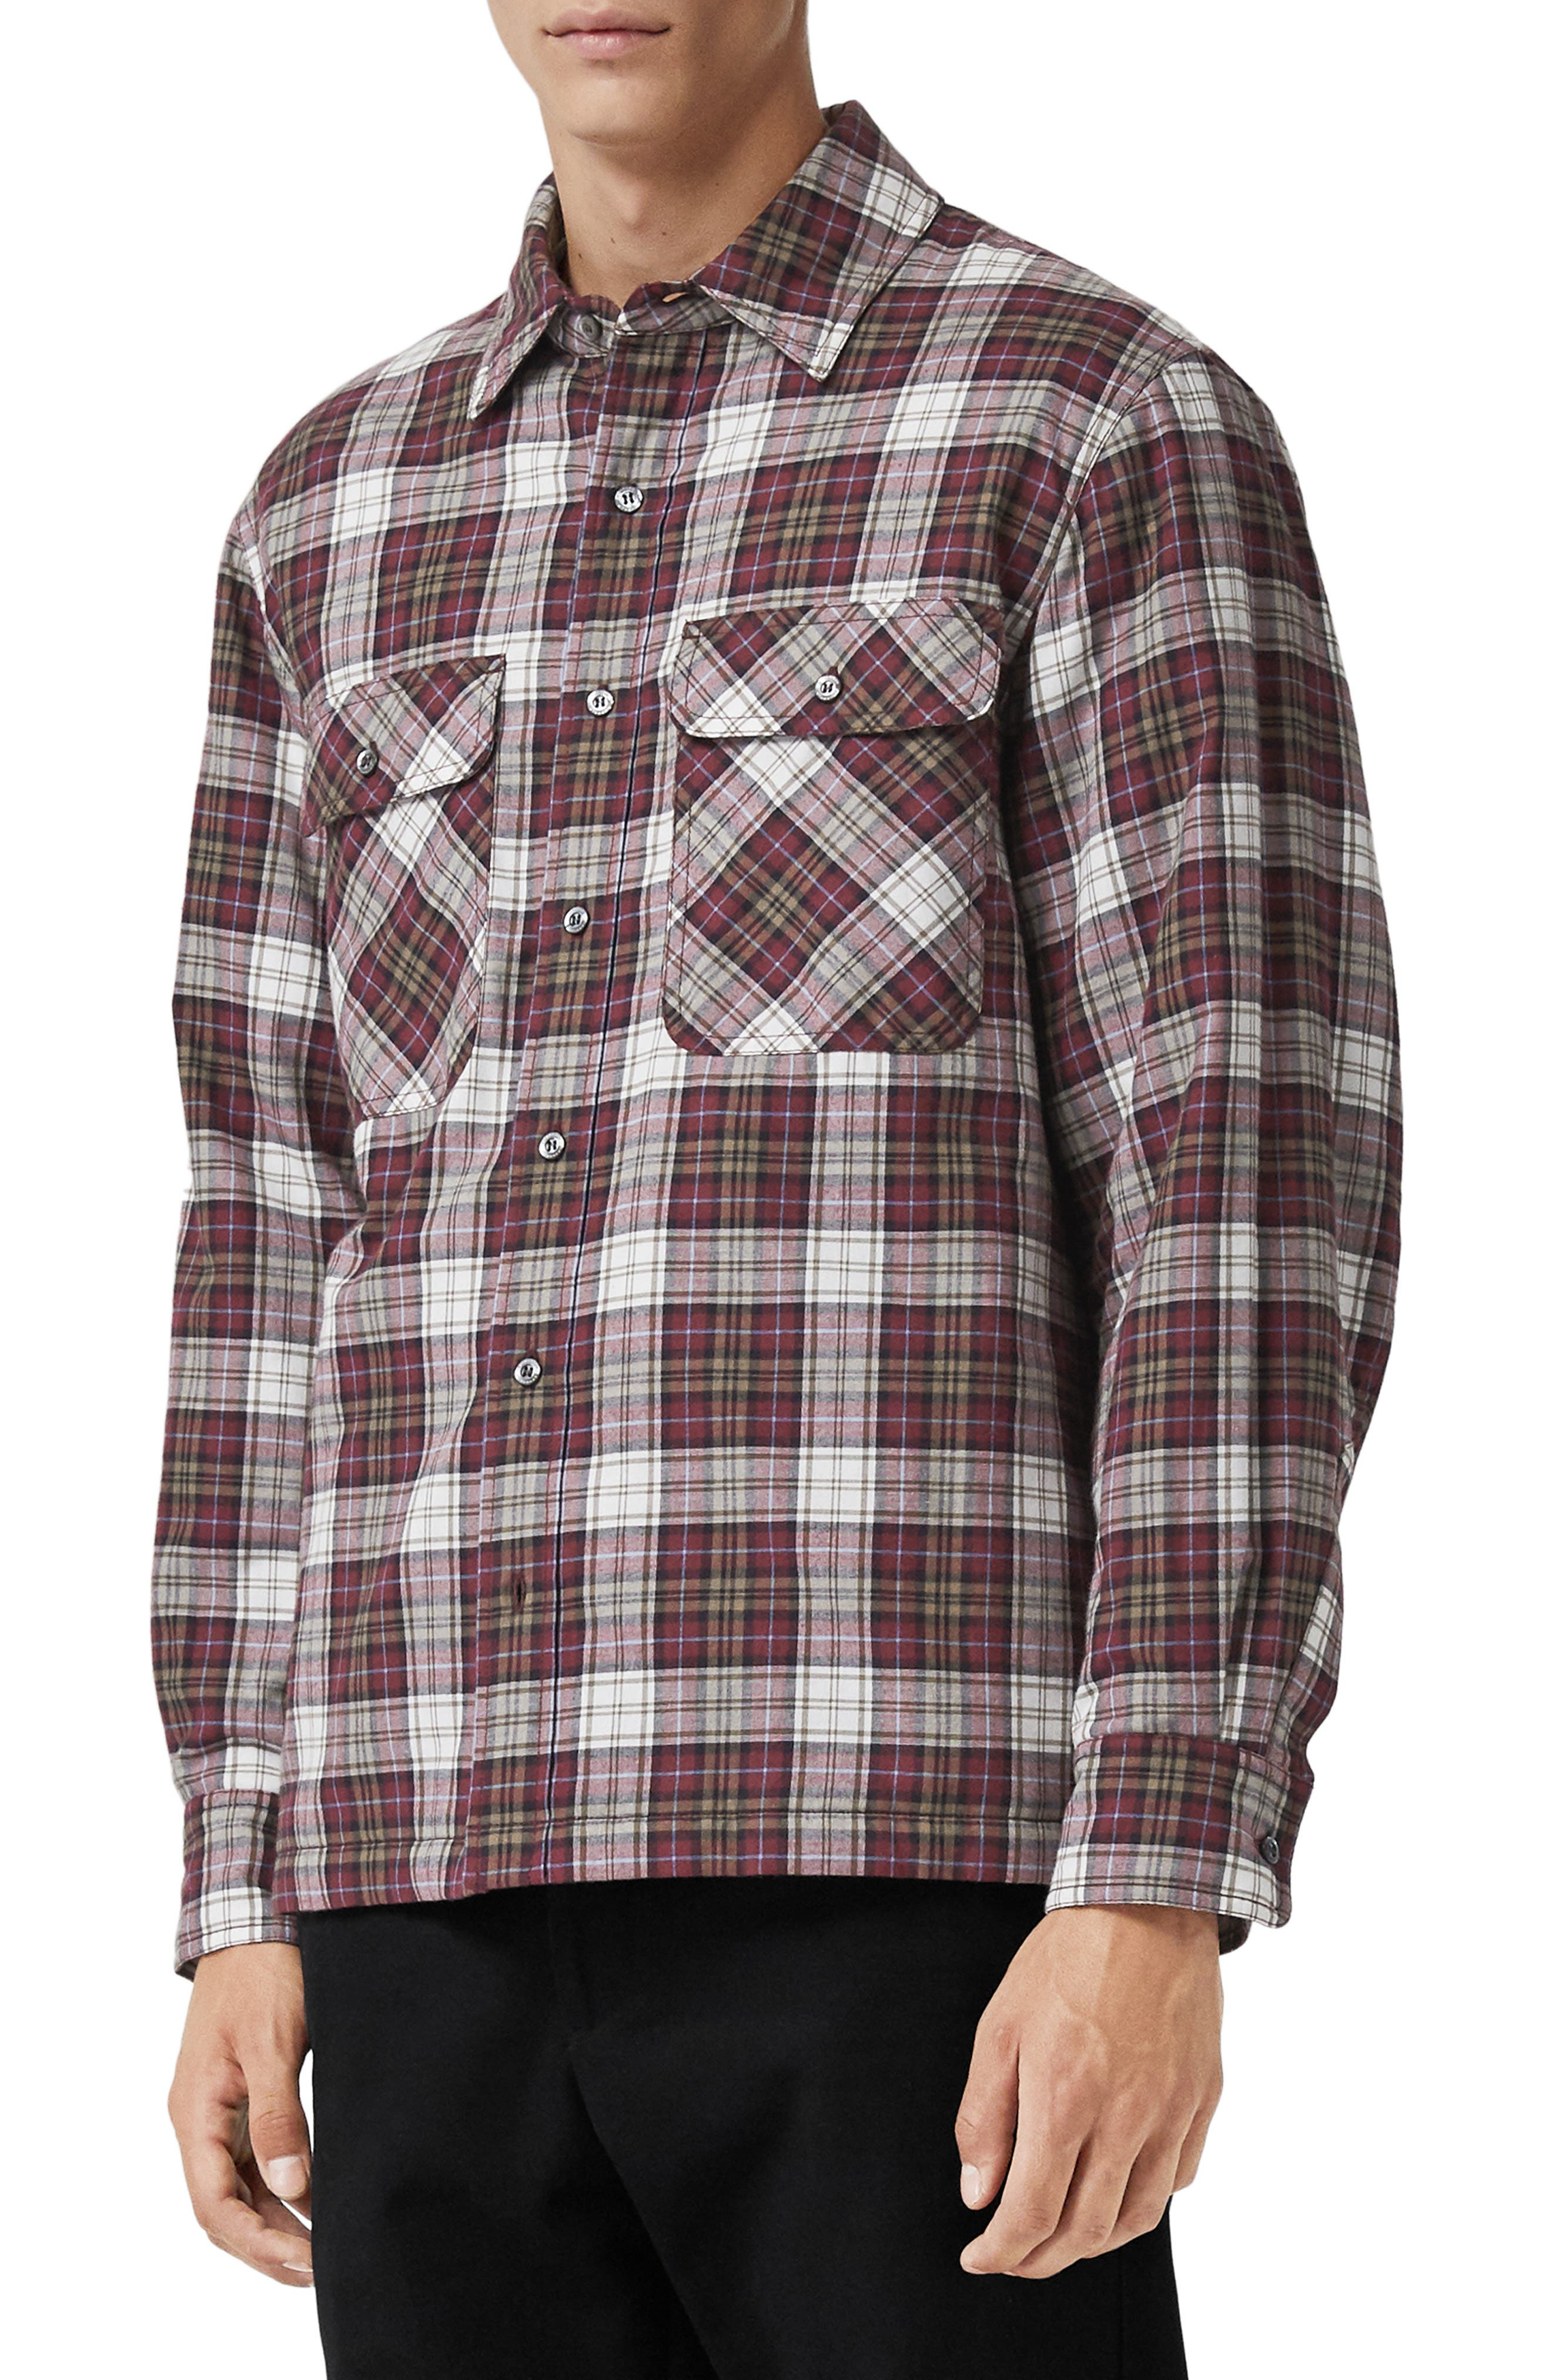 Barlow Plaid Flannel Shirt,                             Main thumbnail 1, color,                             600